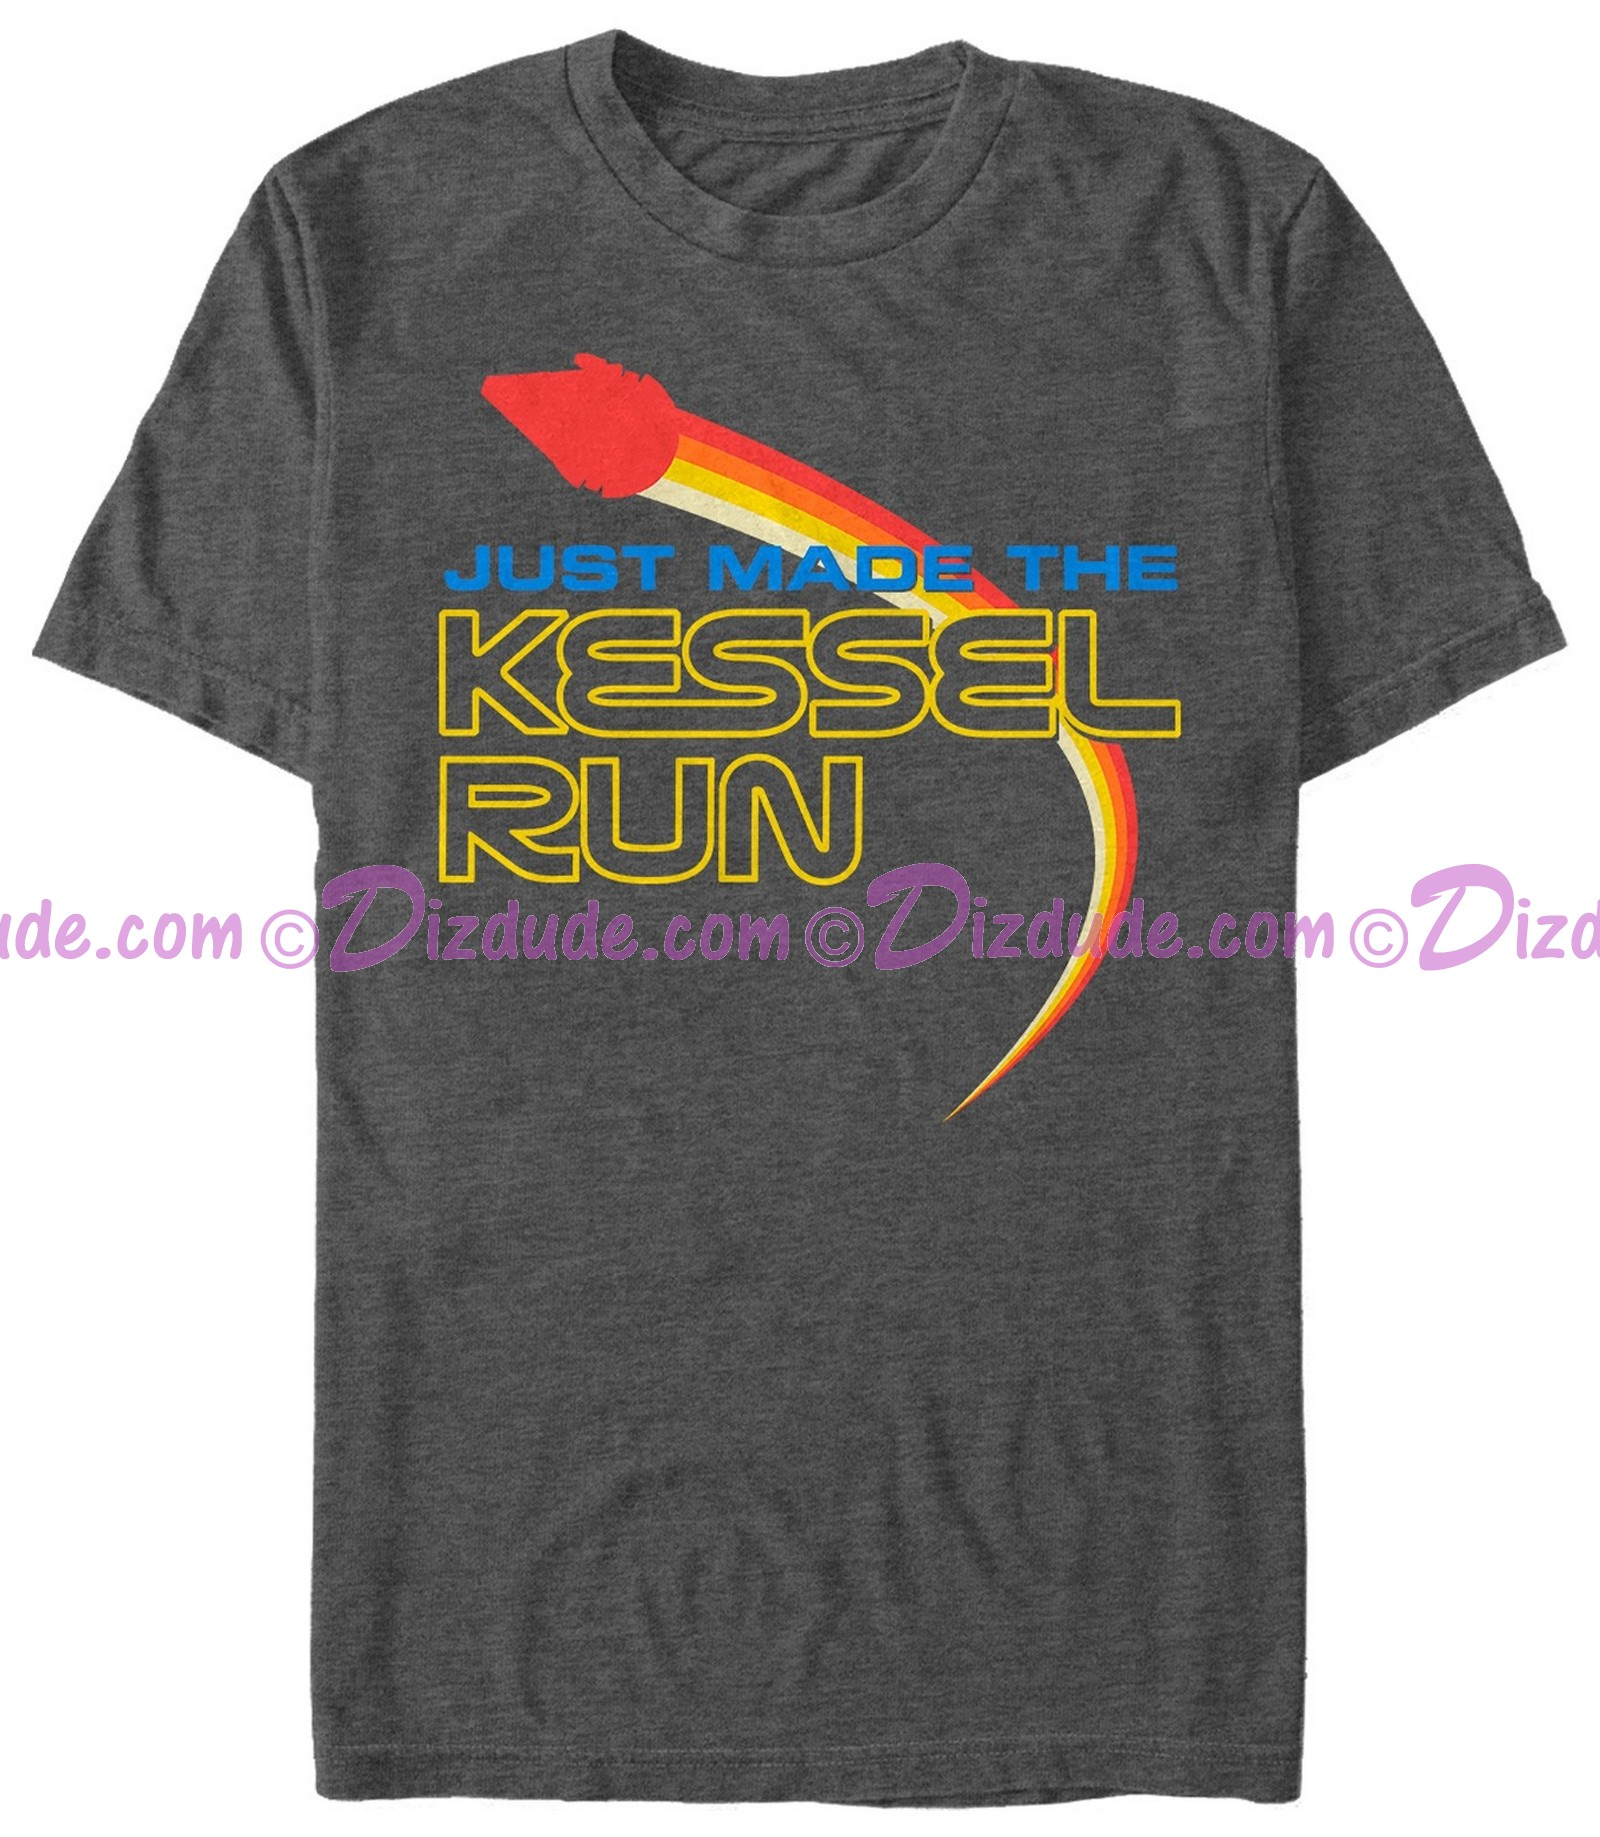 SOLO A Star Wars Story Just Made the Kessel Run Adult T-Shirt (Tshirt, T shirt or Tee)  © Dizdude.com